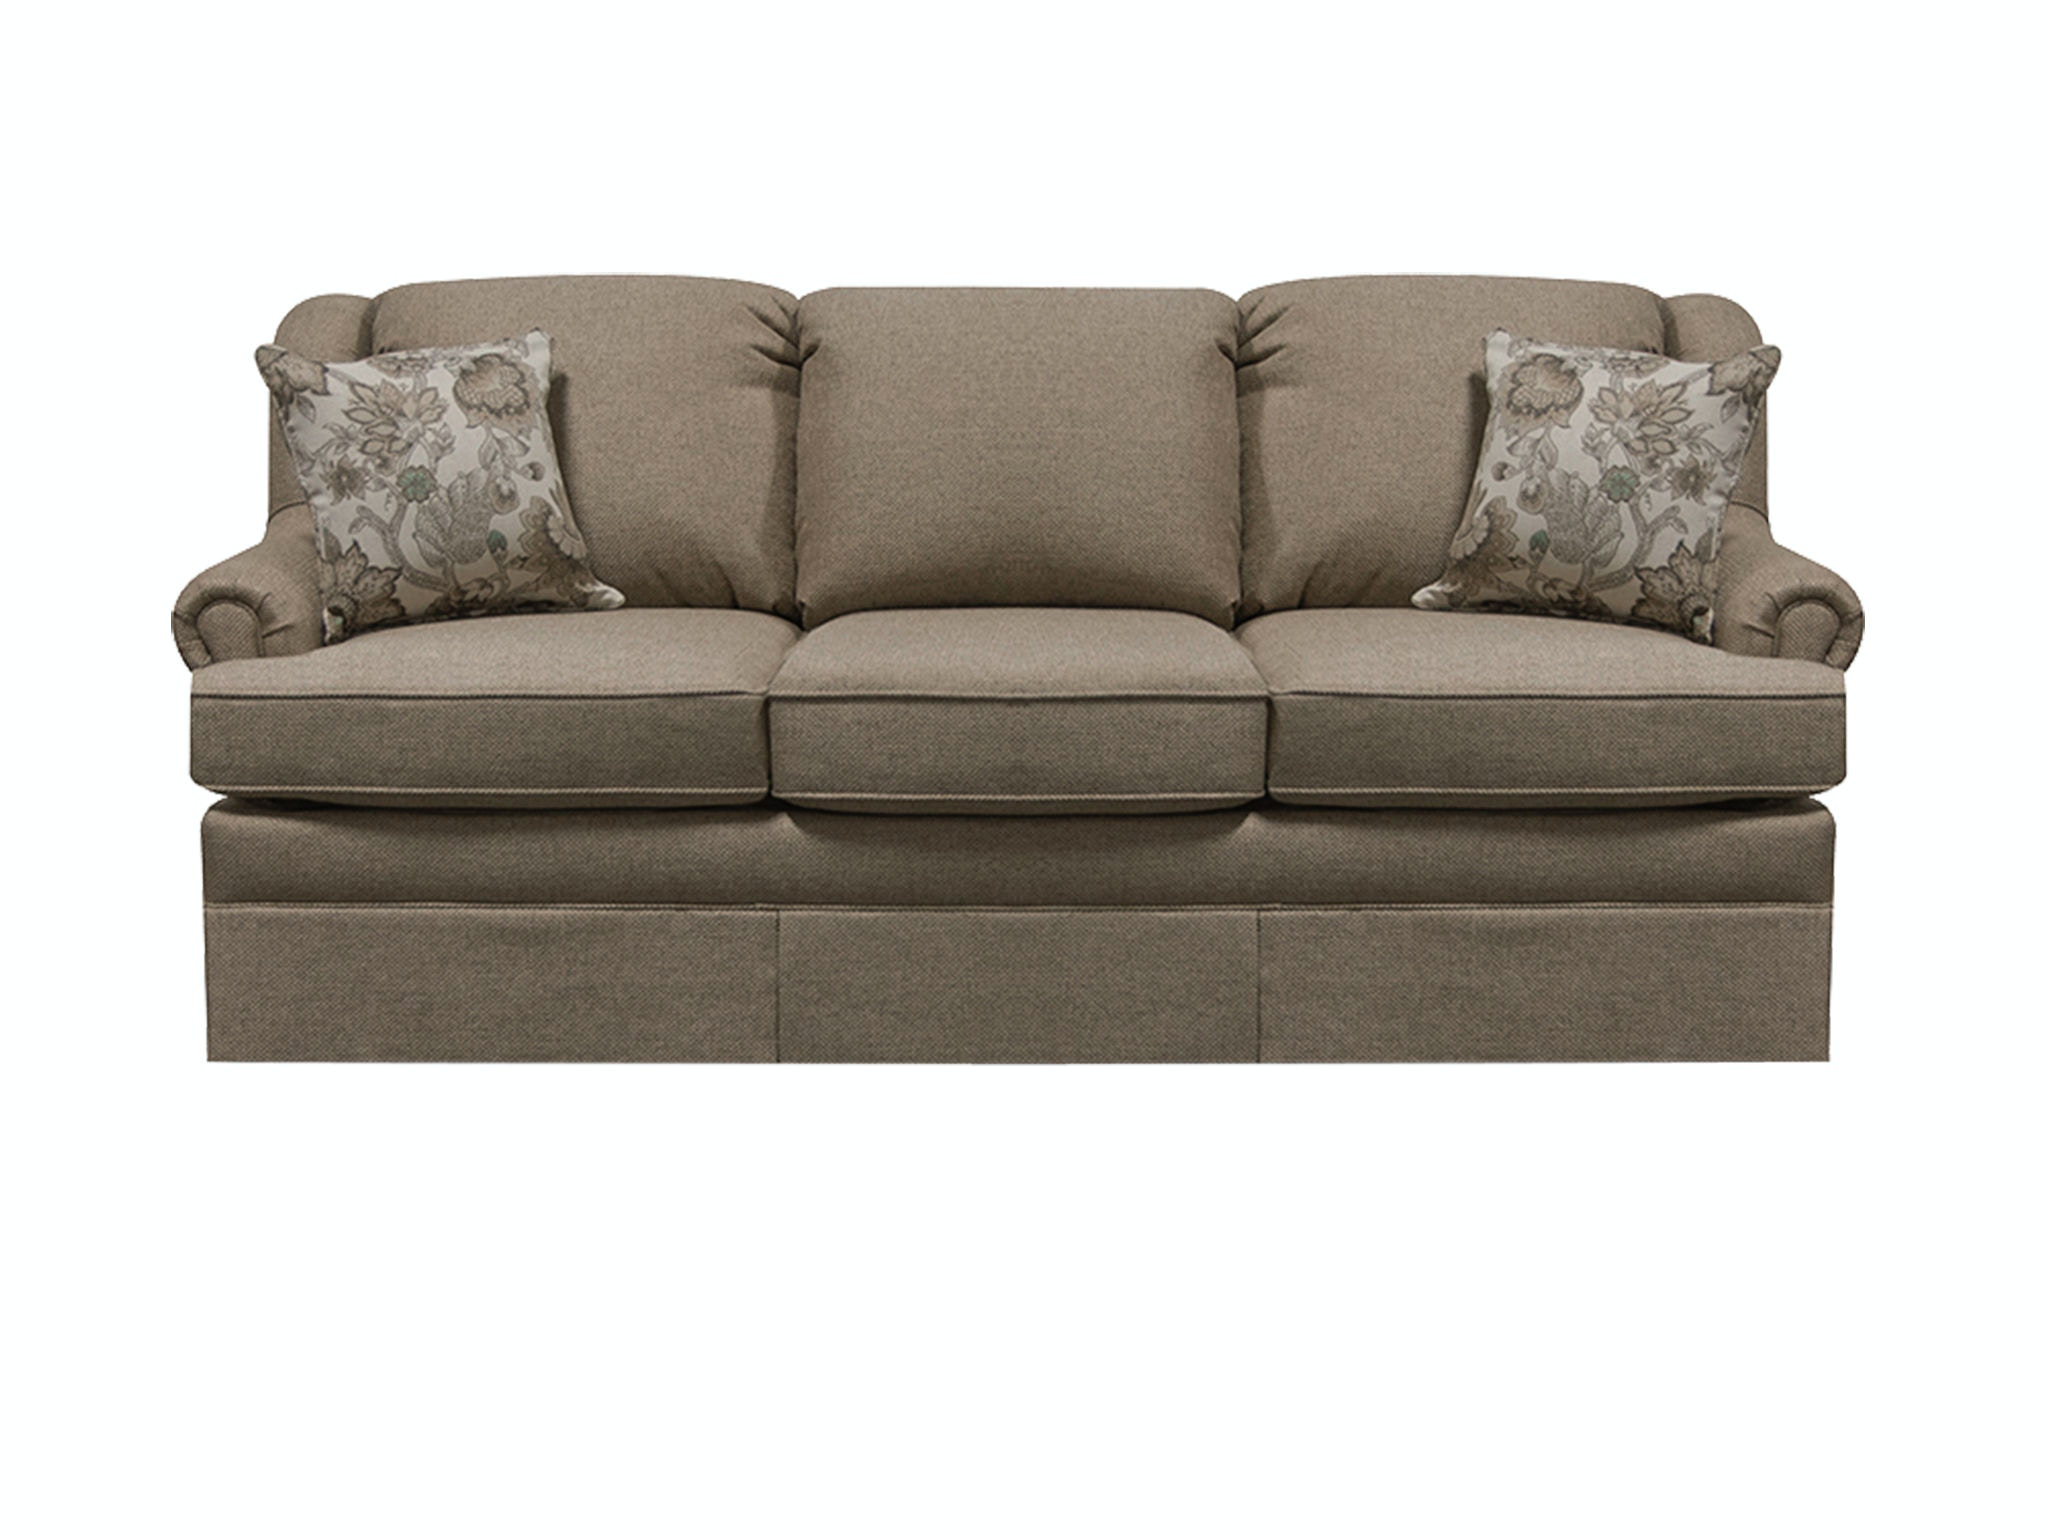 England Living Room Rochelle Sofa 4005 England Furniture New